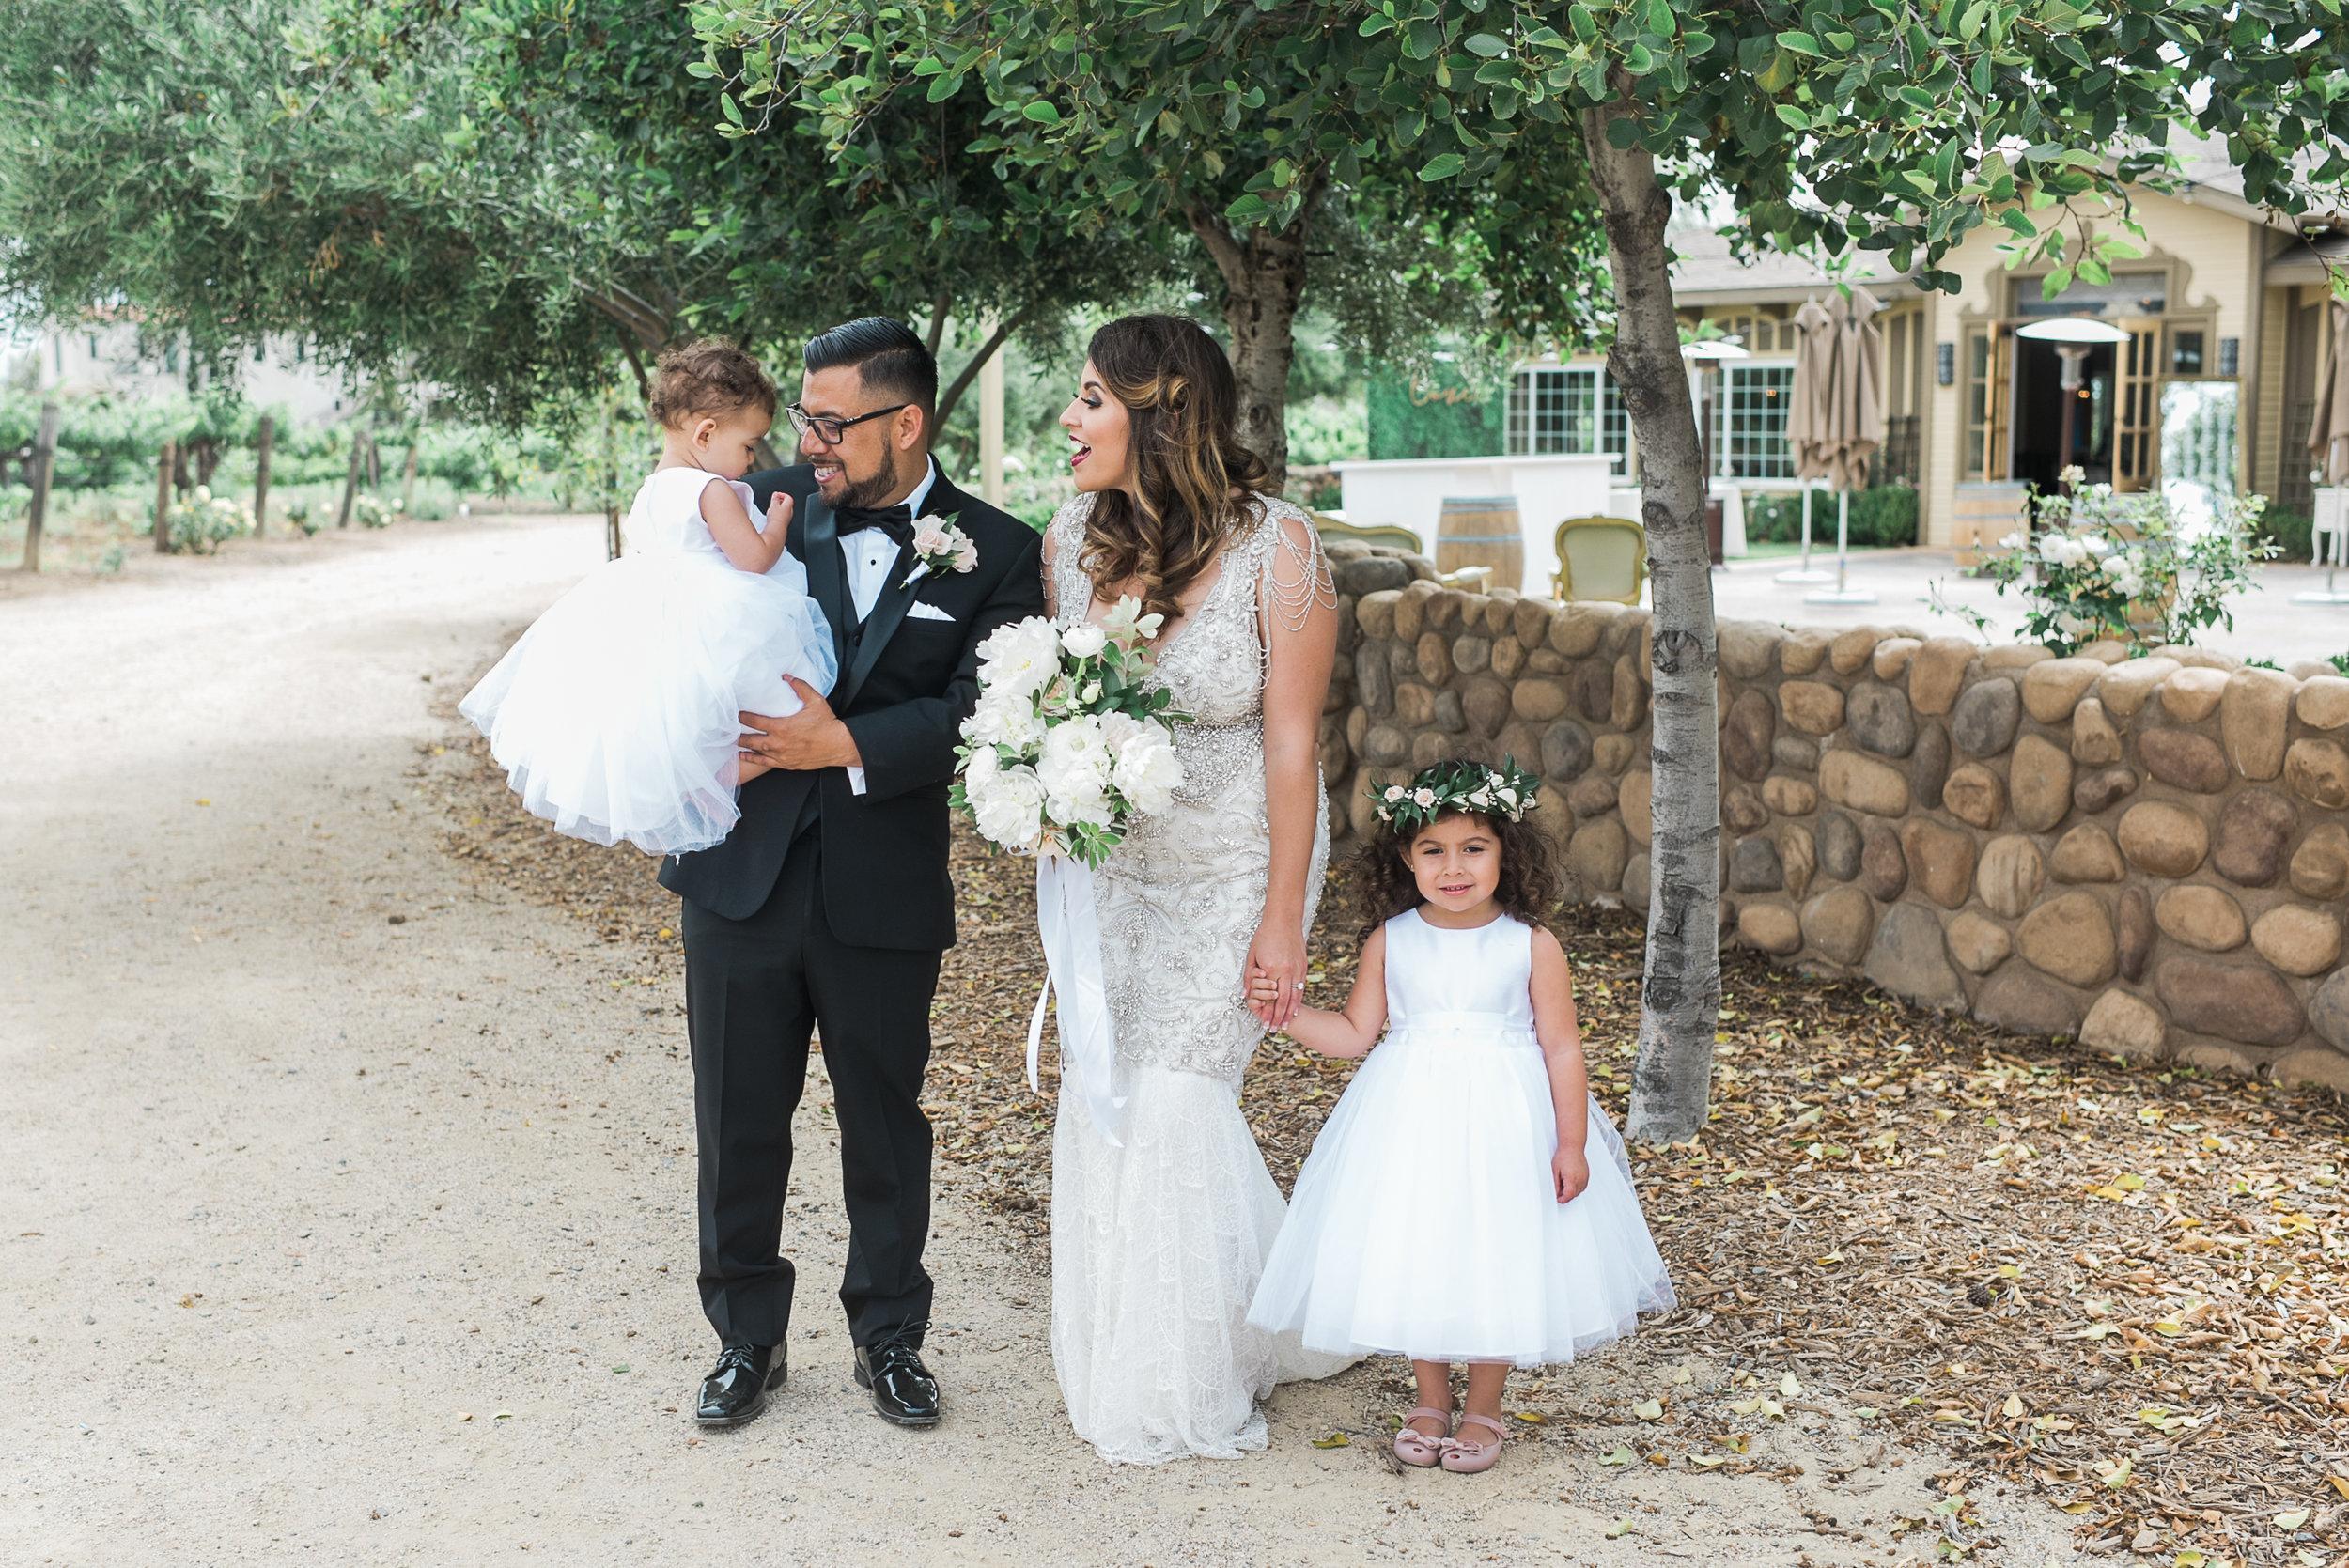 Denise Carlos Wedding - Carissa Woo Photography-0418.jpg